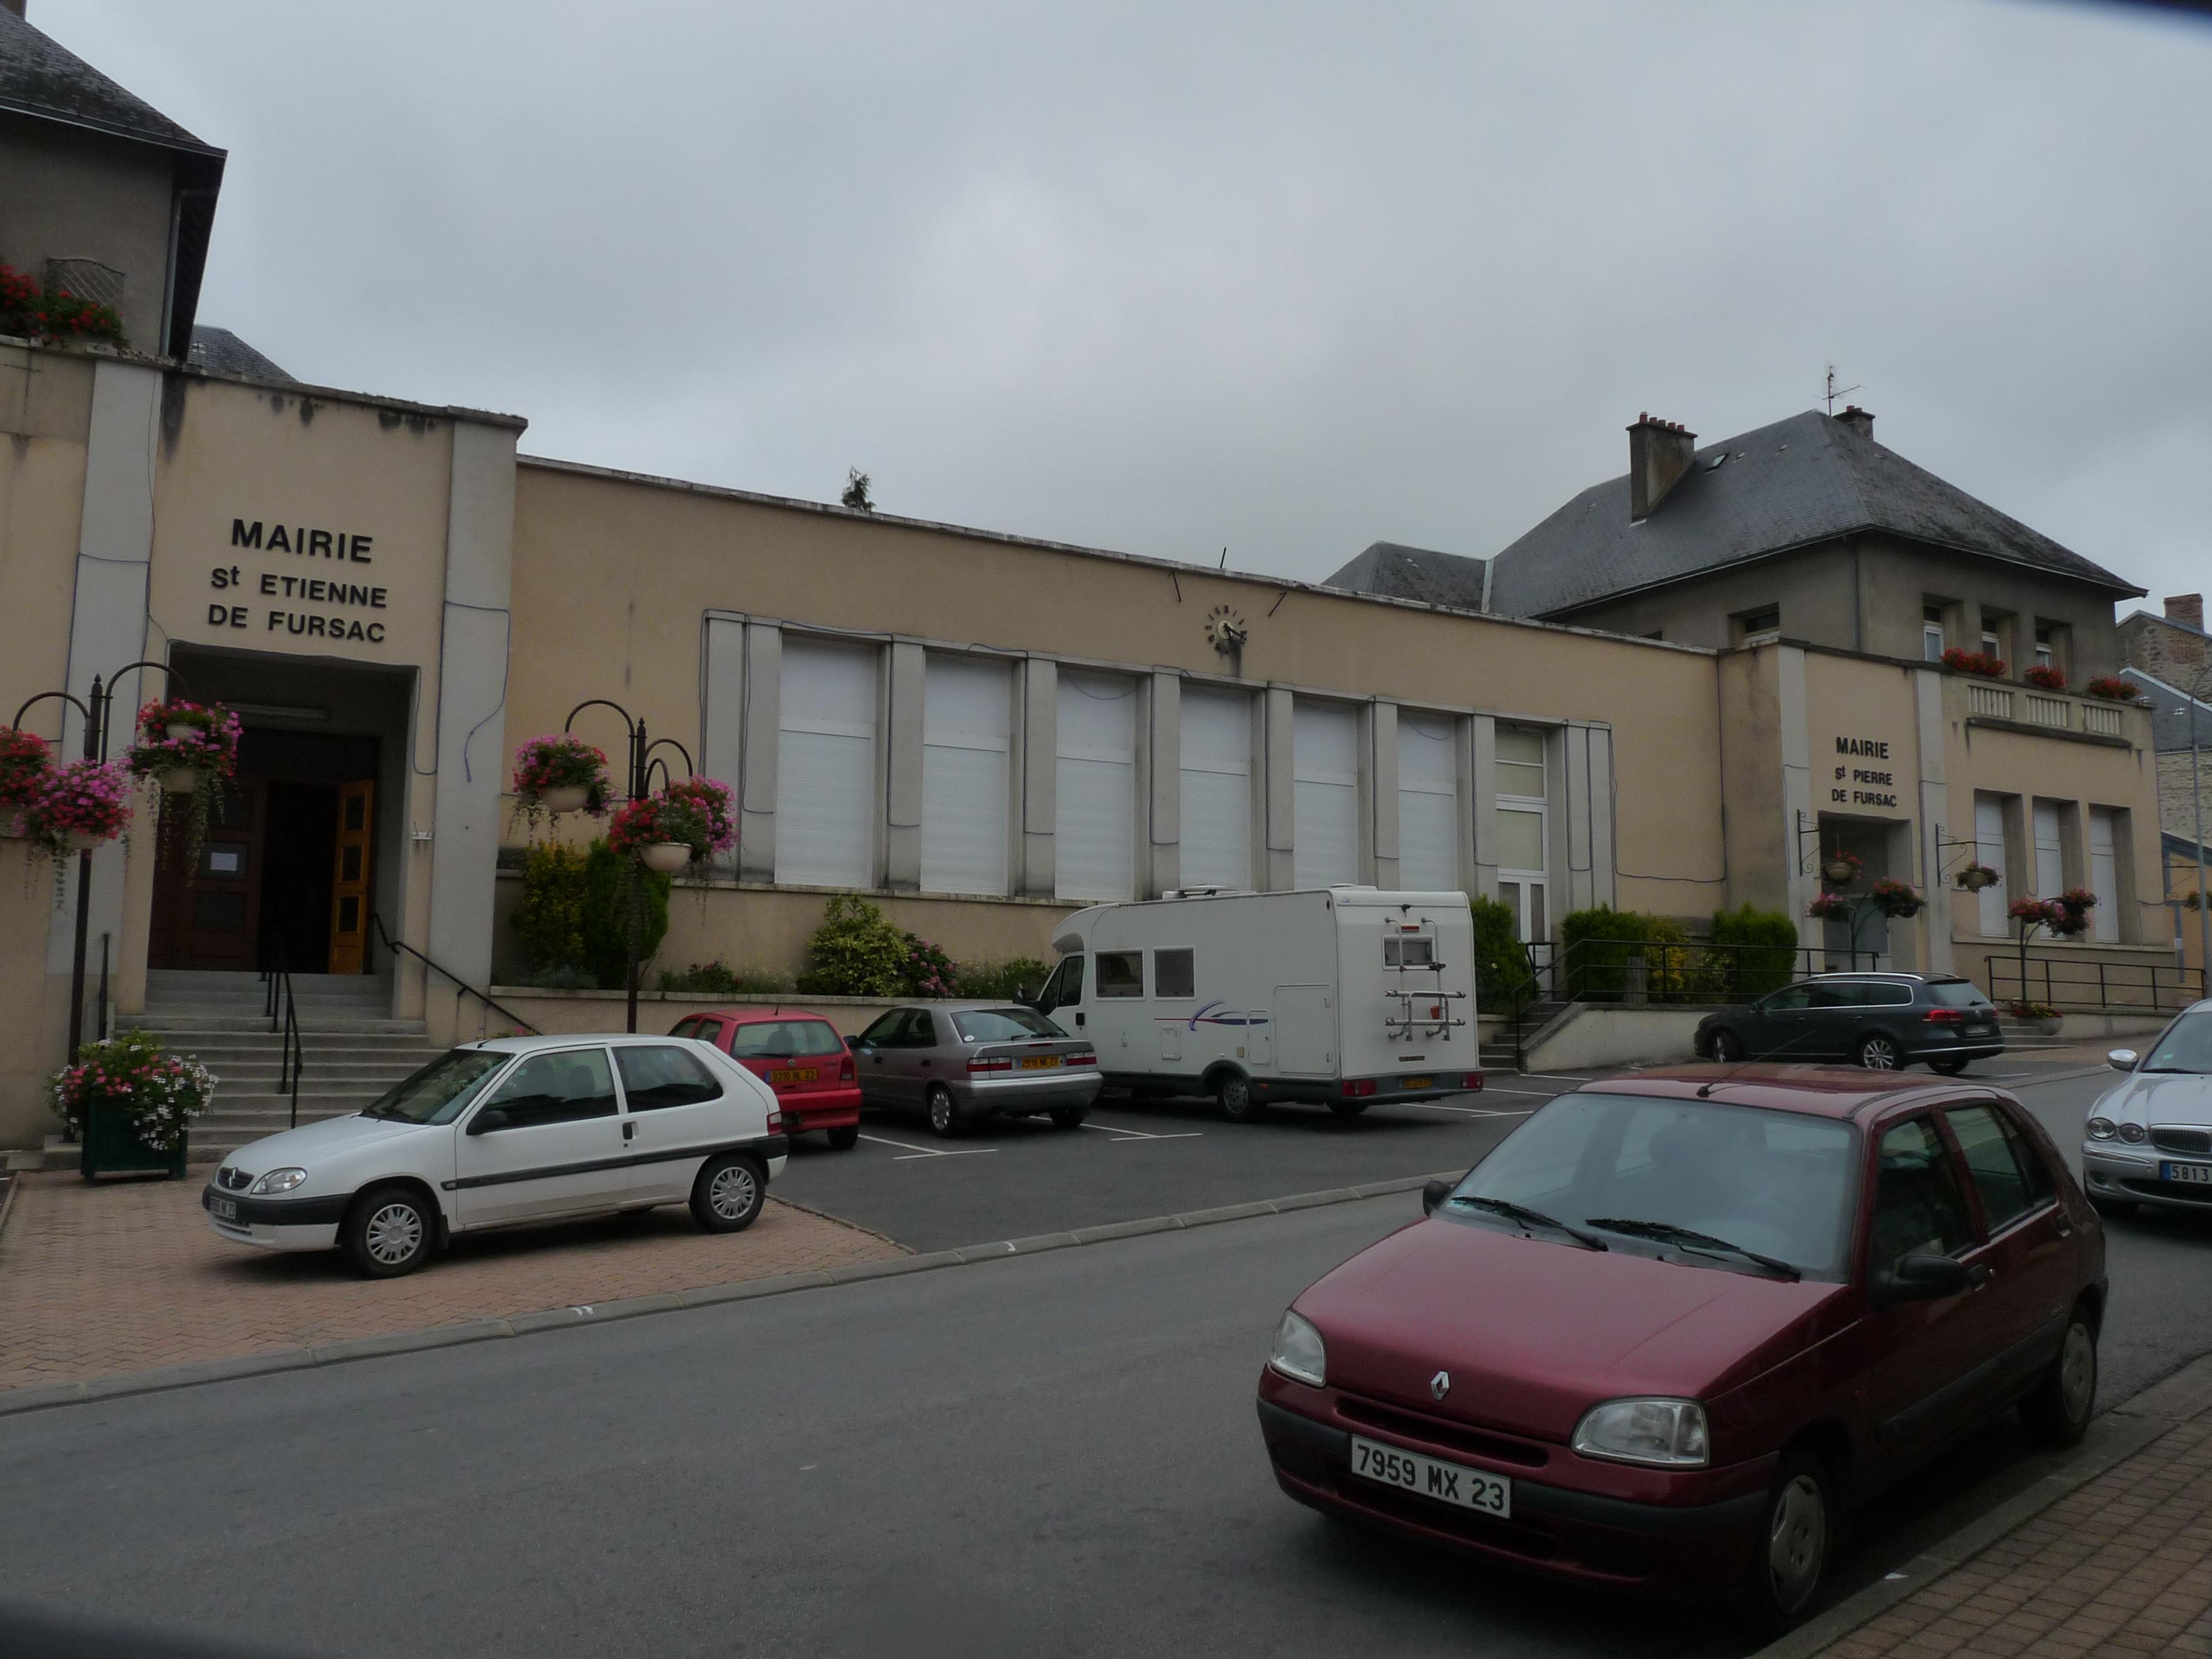 Saint-Pierre-de-Fursac